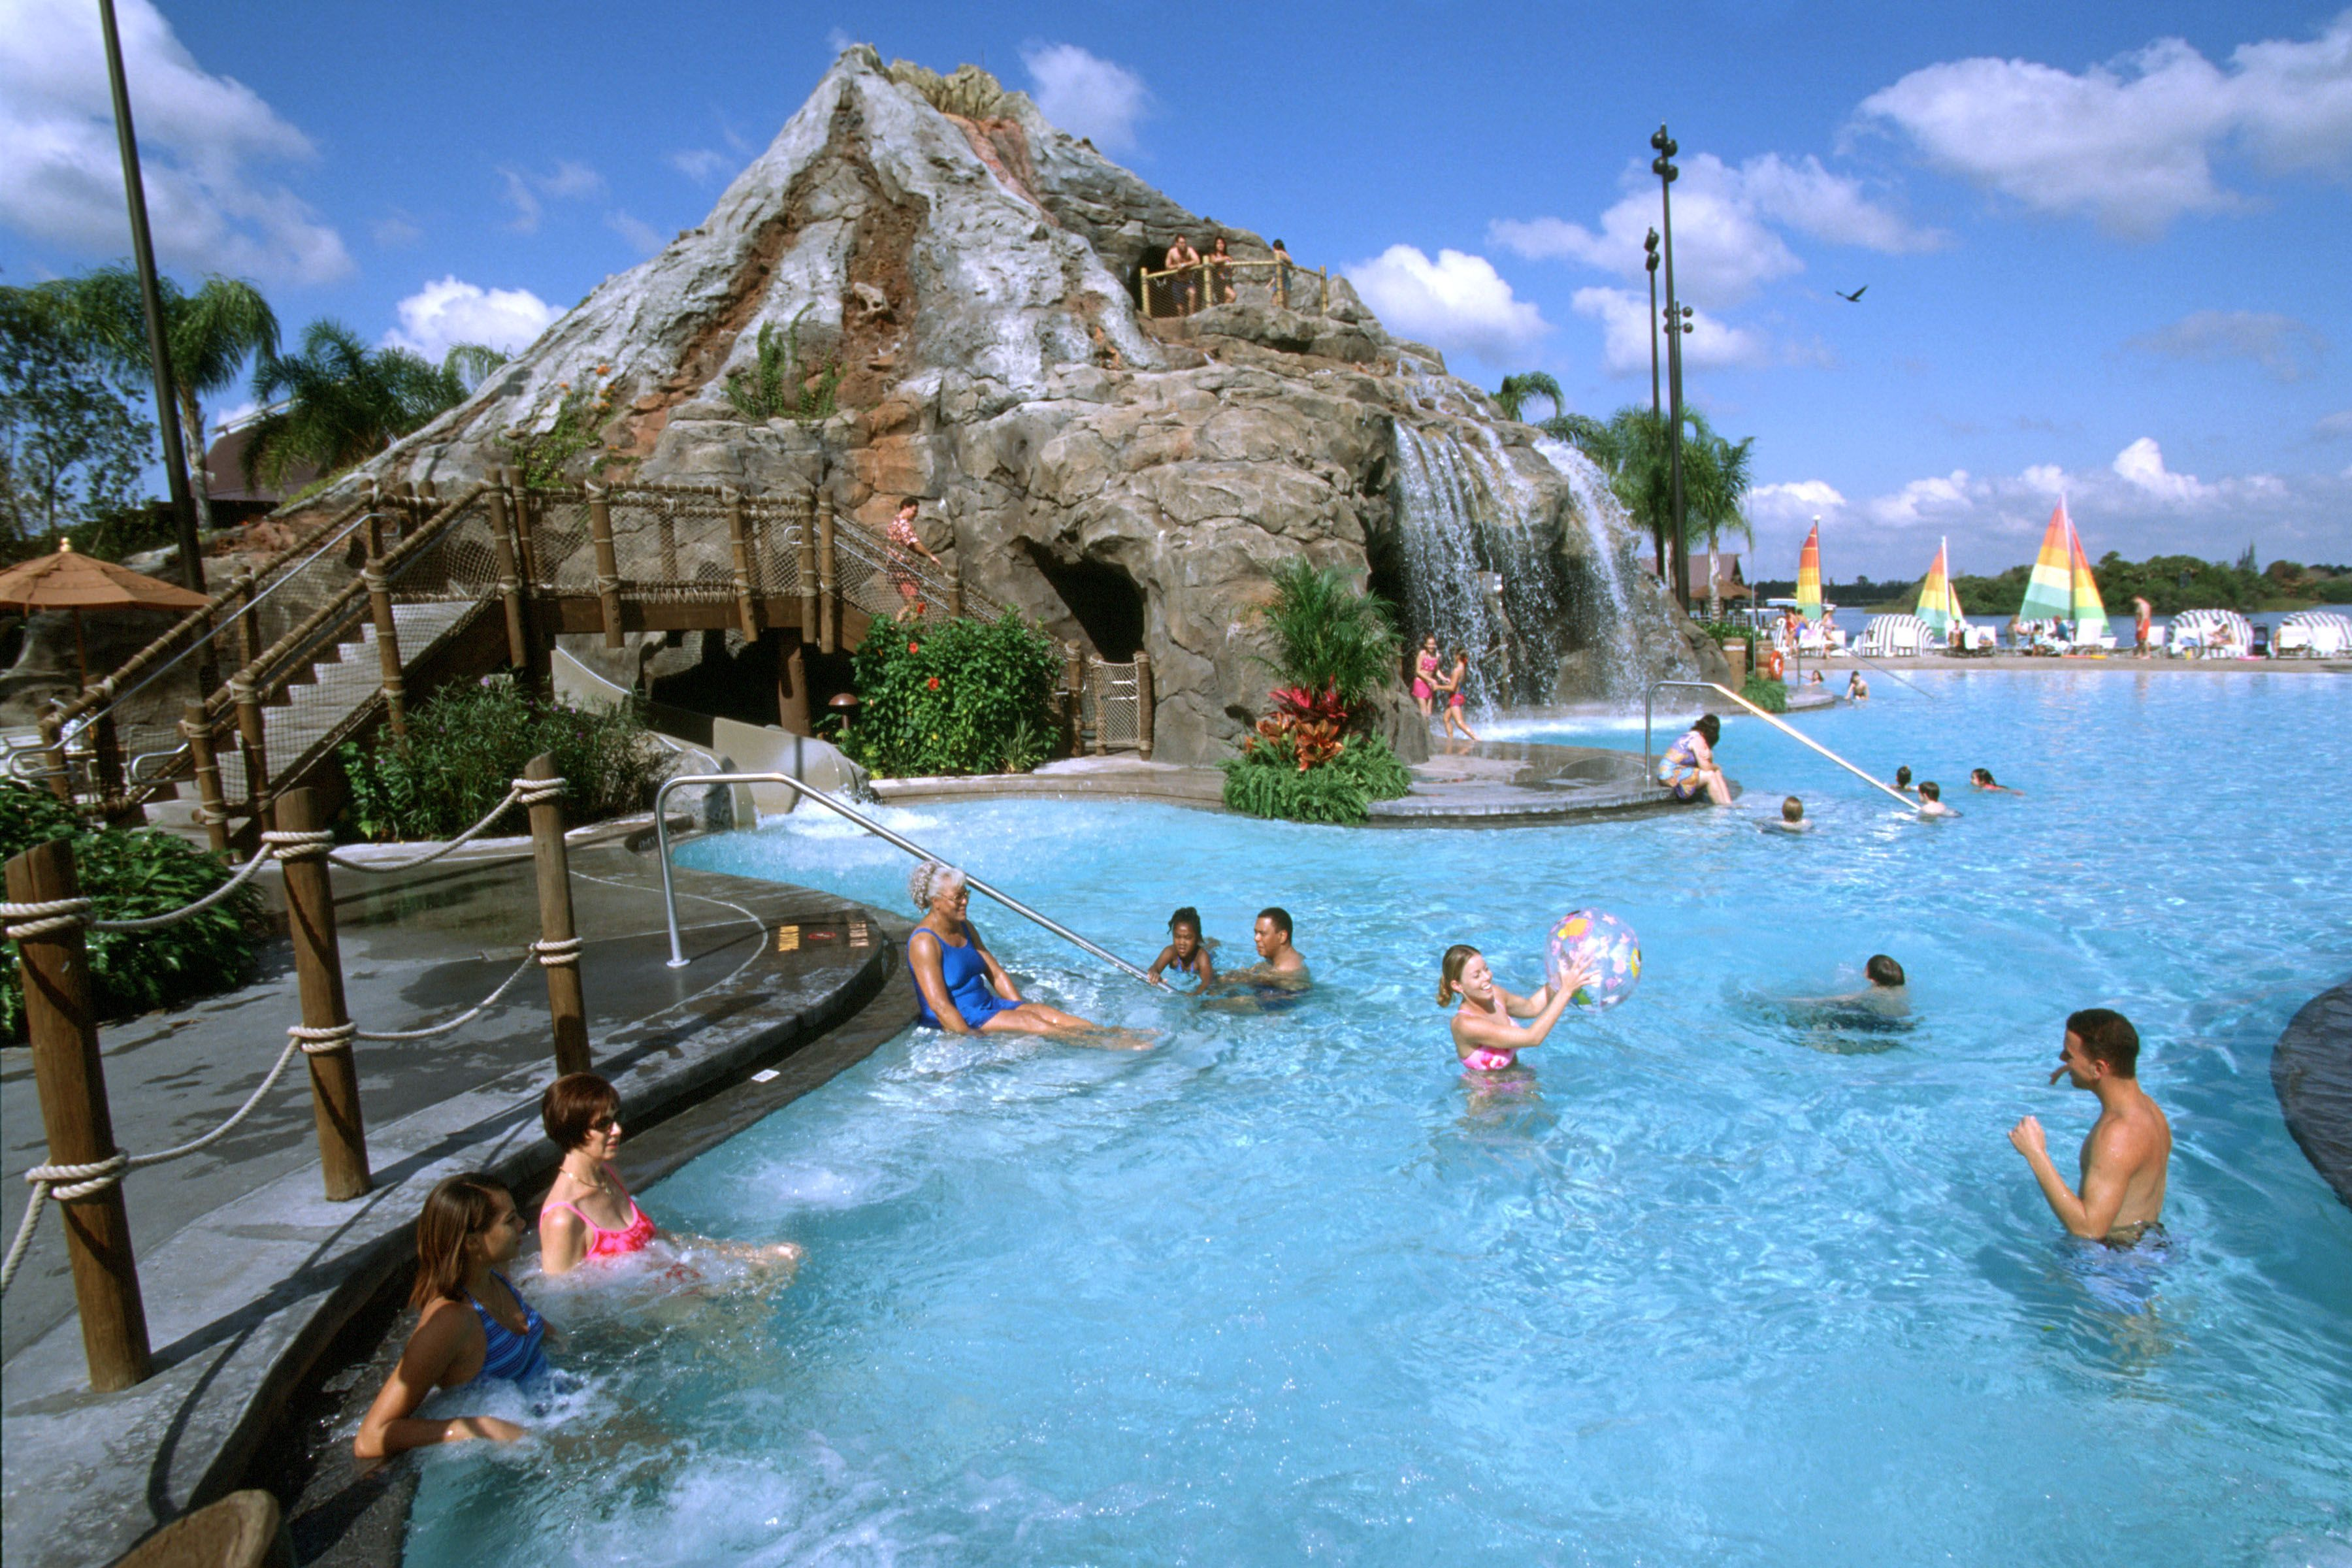 Disney Resort Hotels Disney' Polynesian - Guests